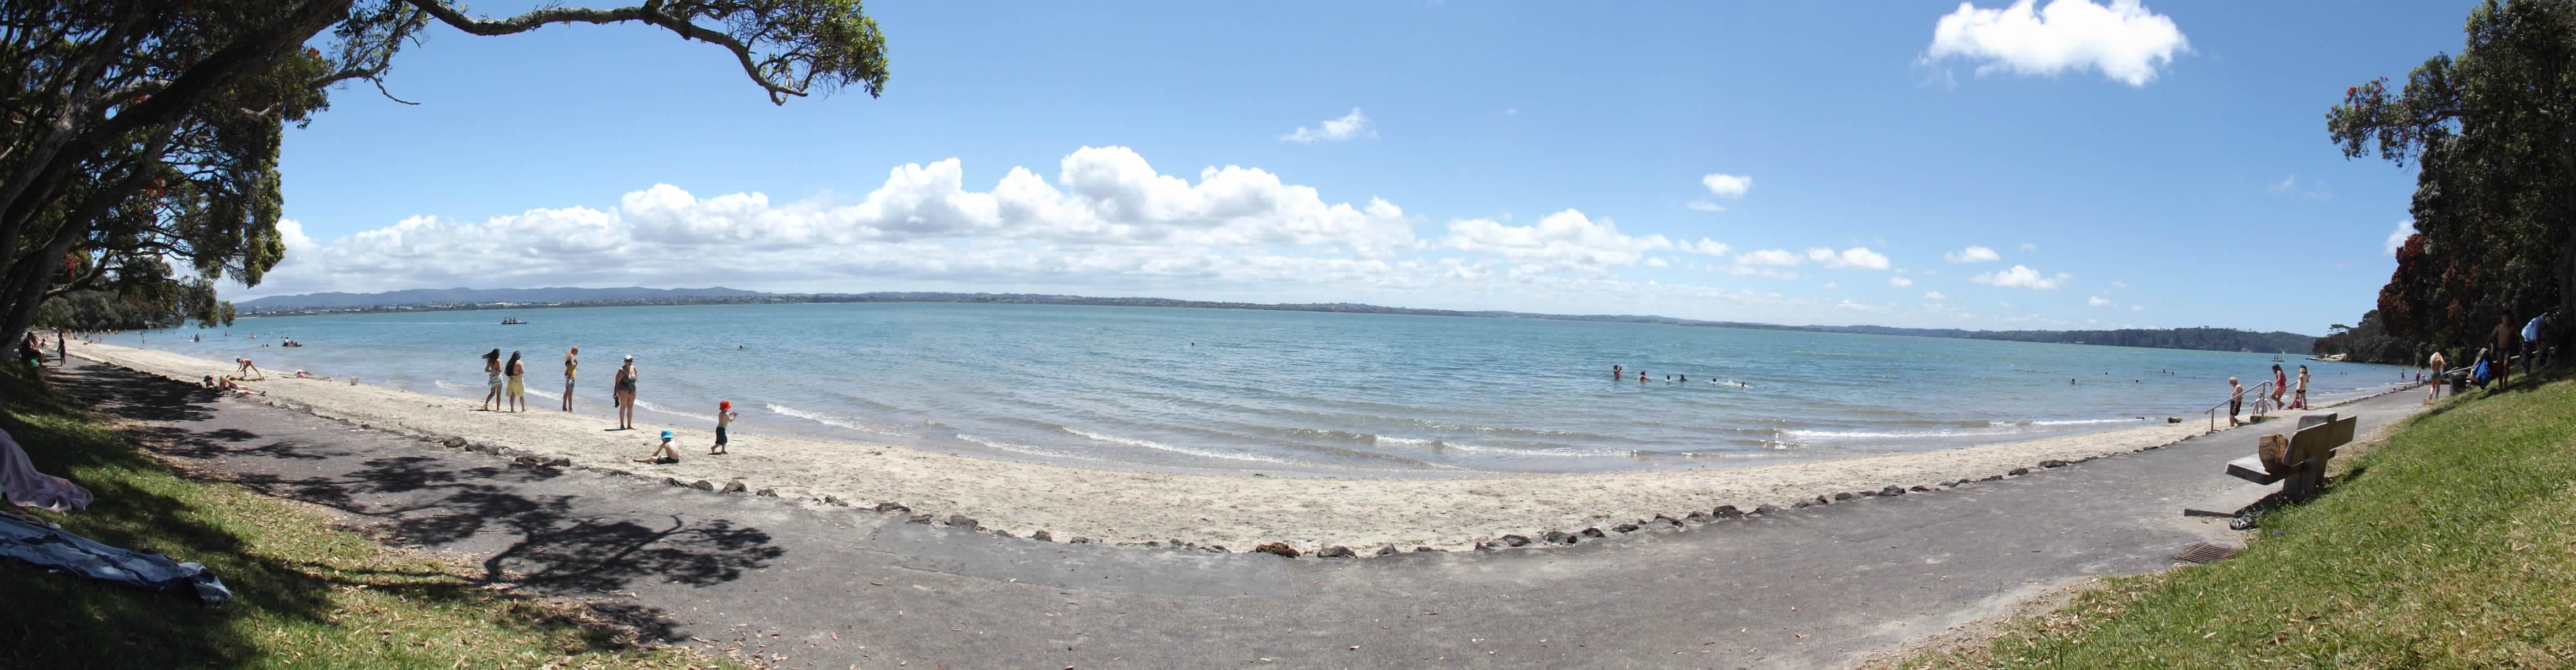 Ptchev beach panorama